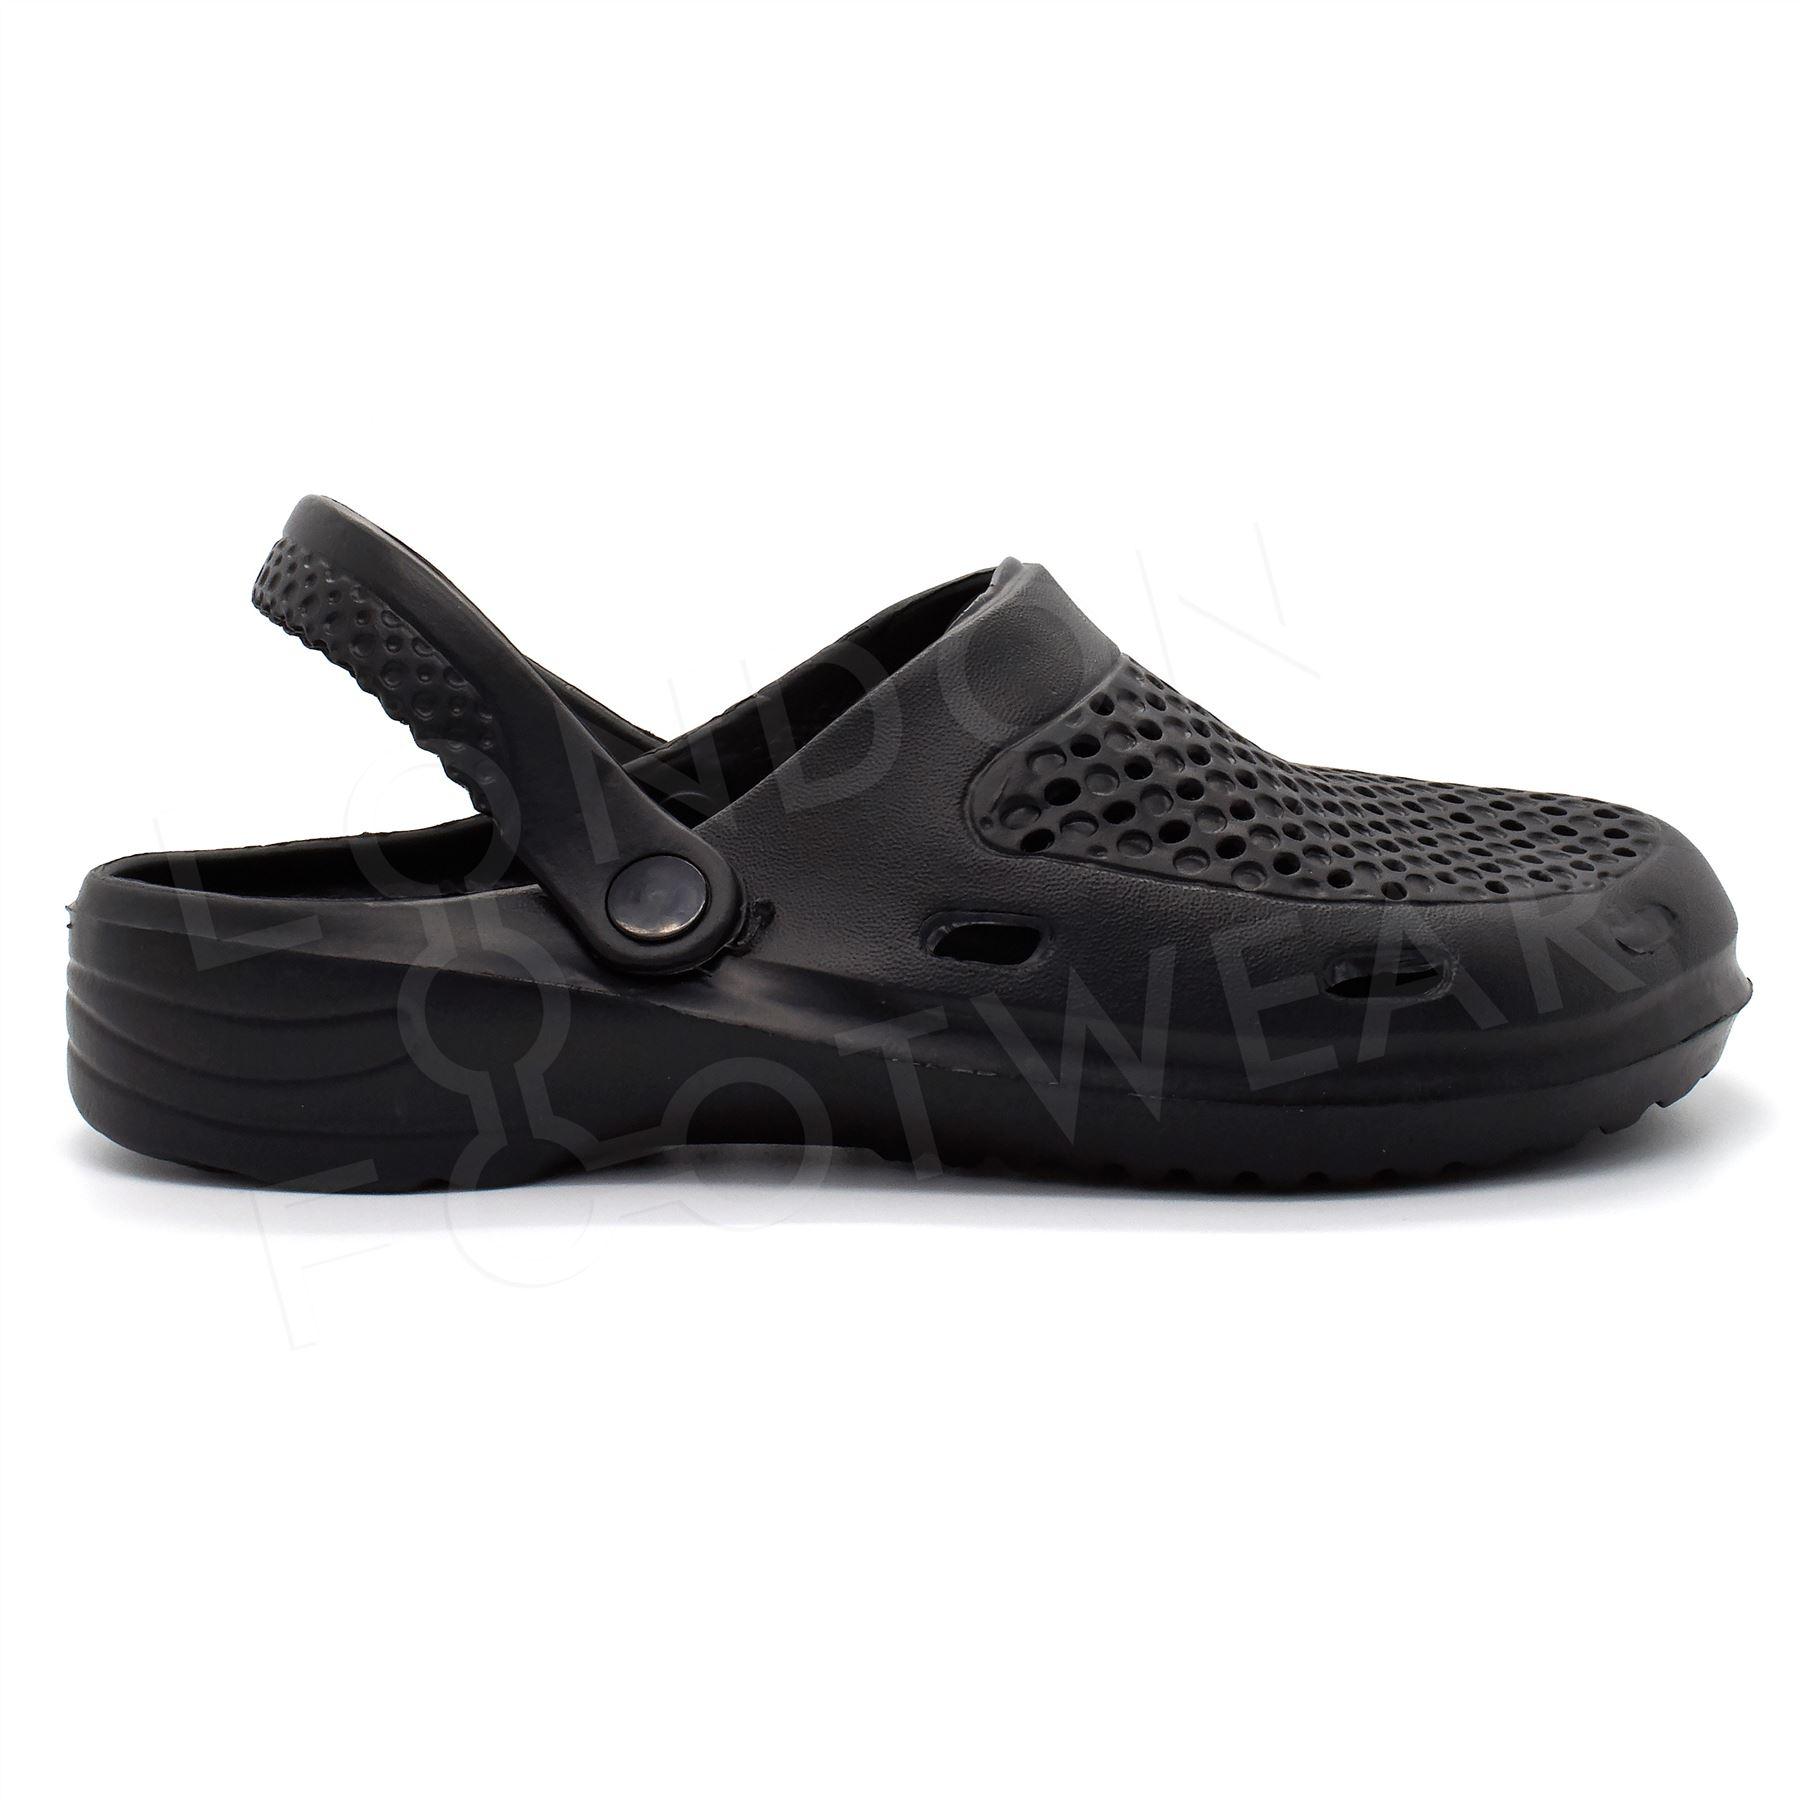 kitchen shoes for men washable runners new mens clogs slip on garden hospital